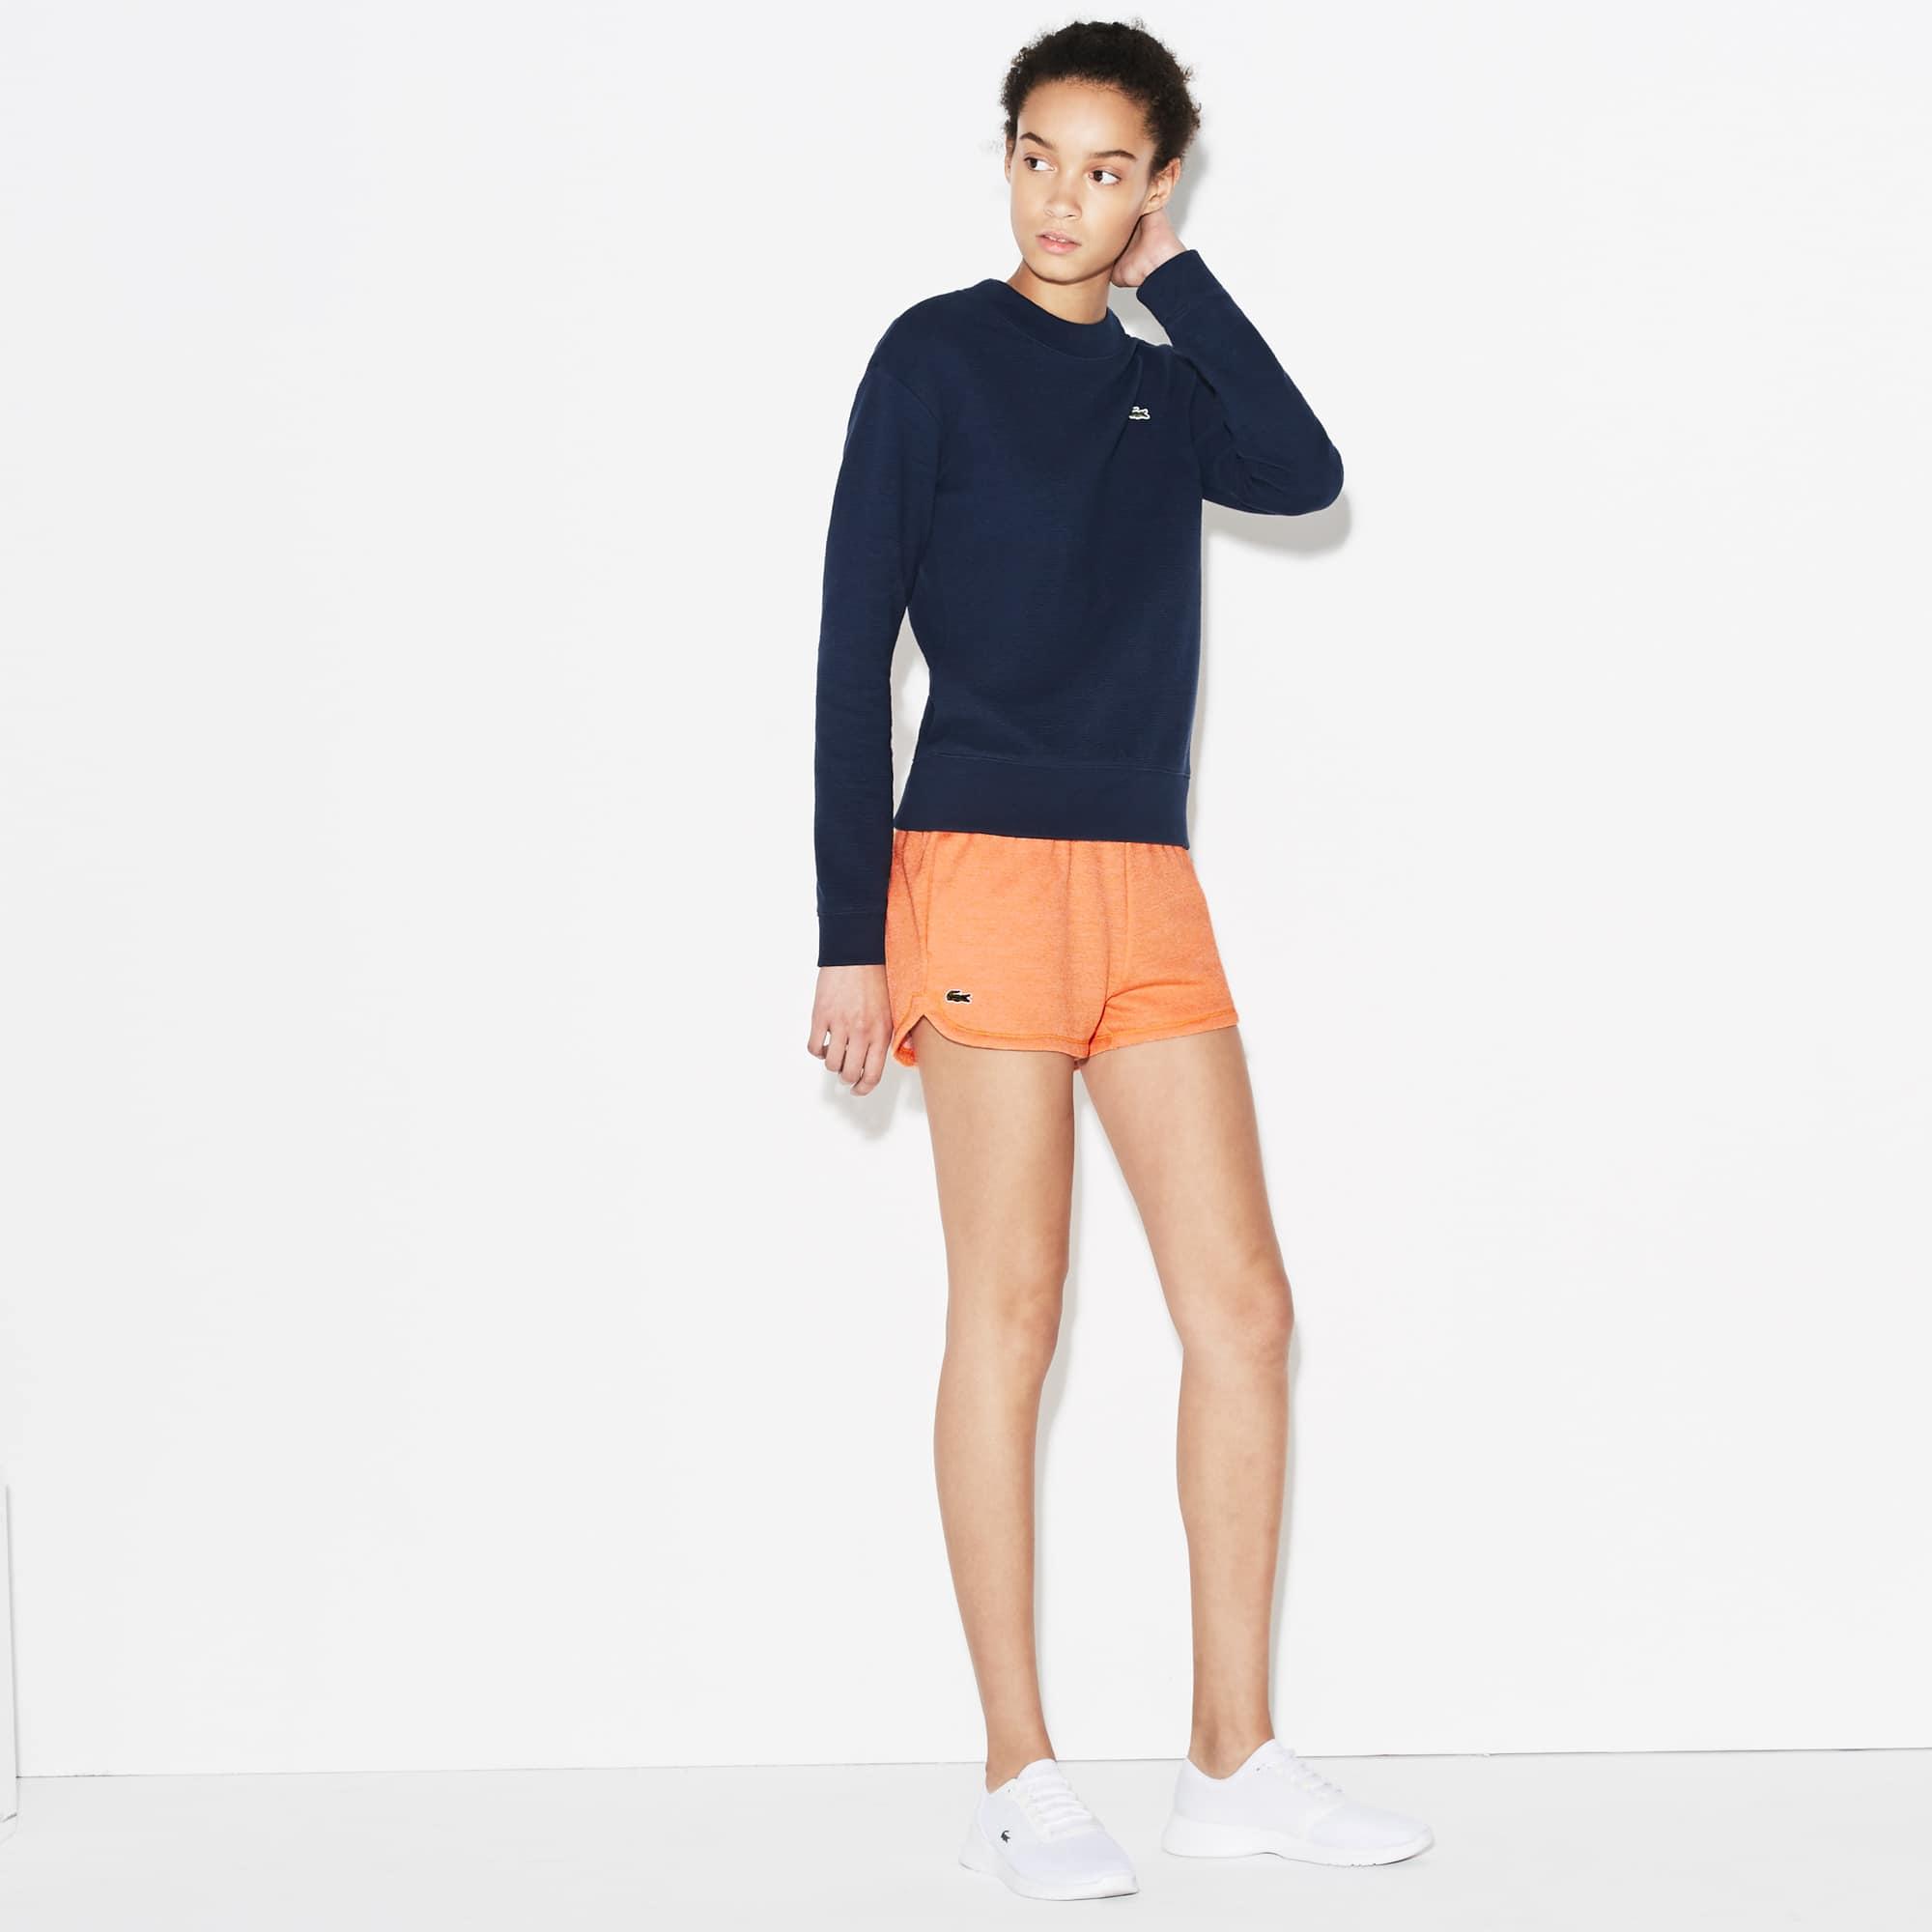 Damen-Shorts aus Fleece LACOSTE SPORT TENNIS